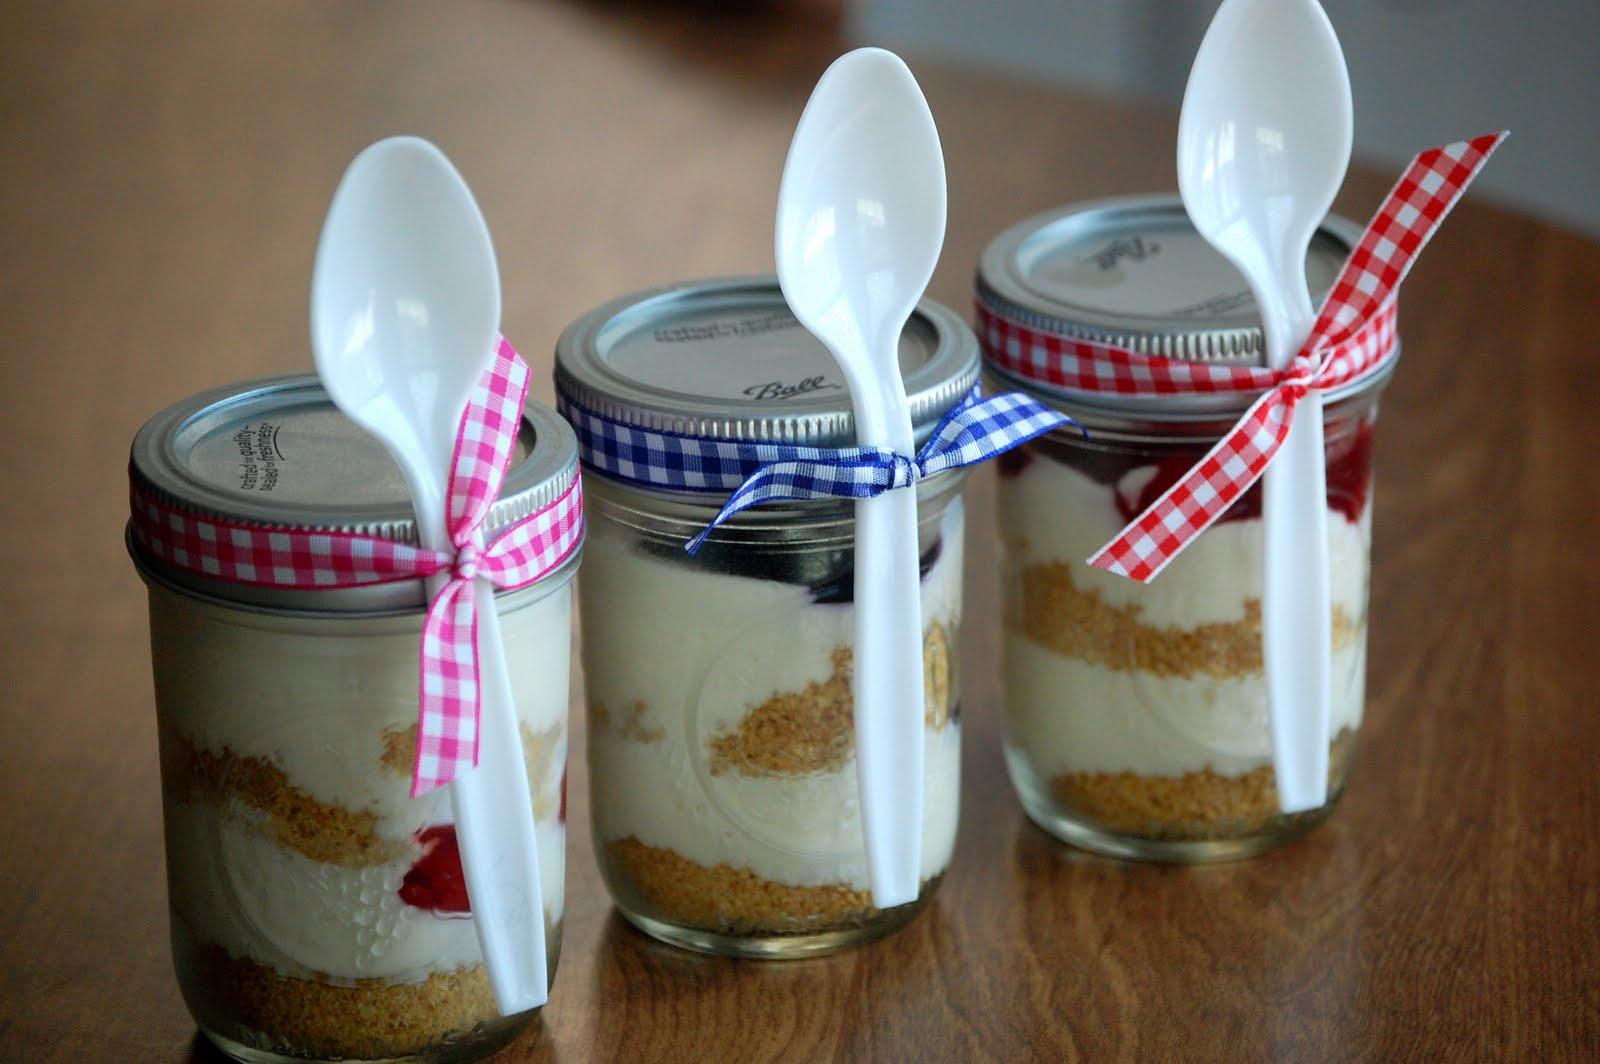 Heritage Schoolhouse: Cheesecake in a Jar